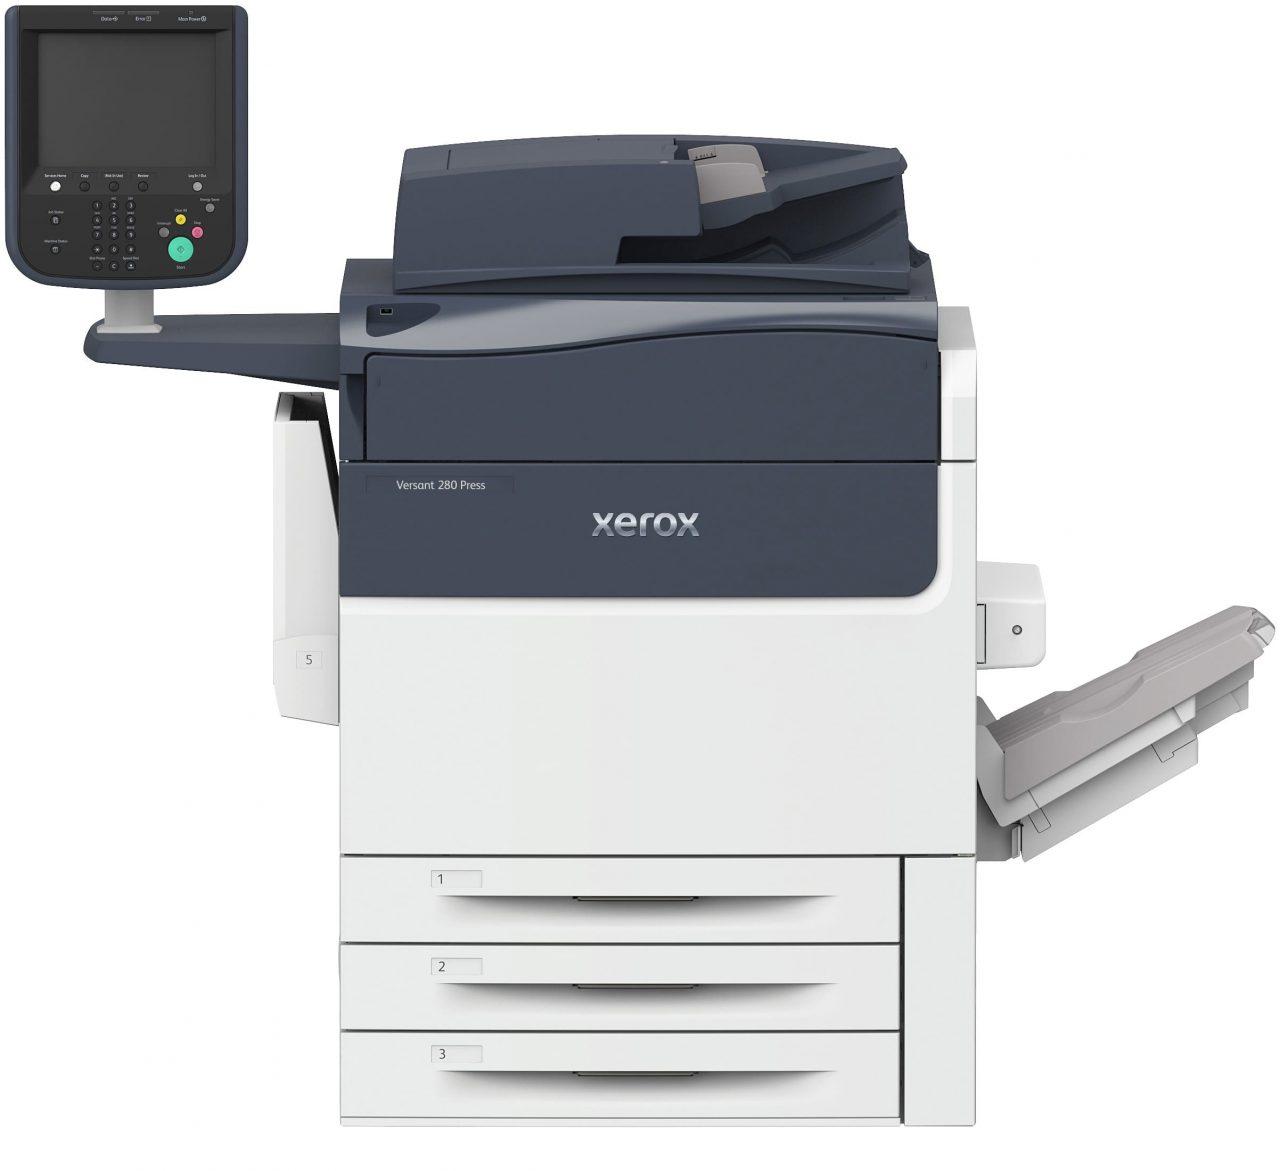 Xerox Versant 280 press